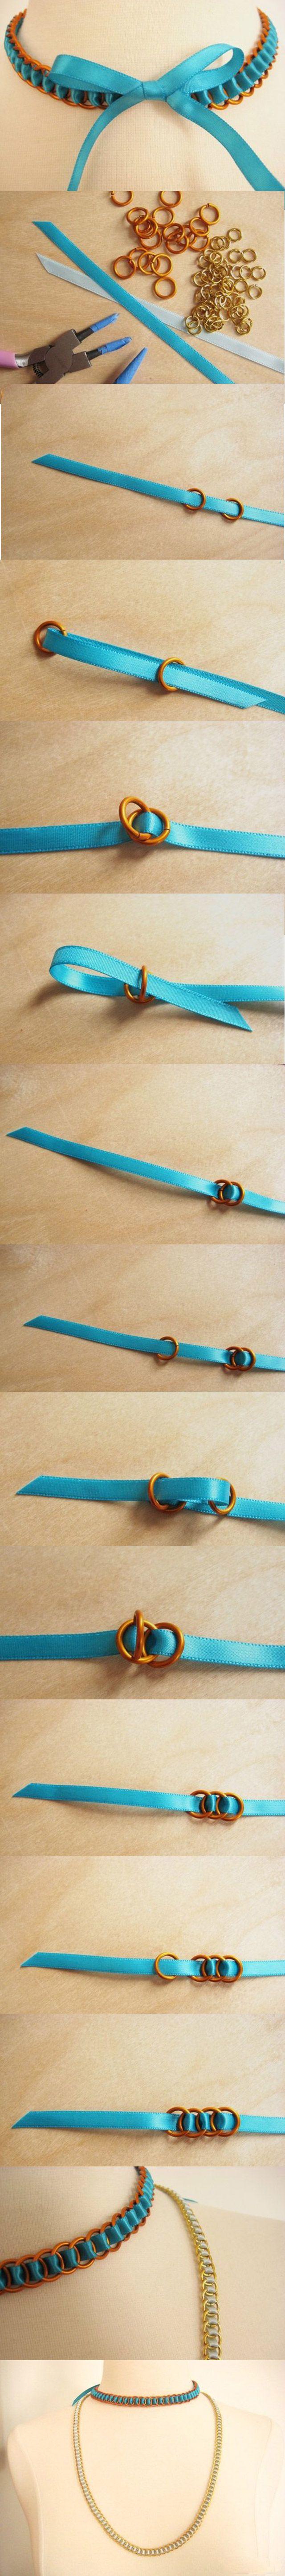 DIY necklace jewelry diy craft choker